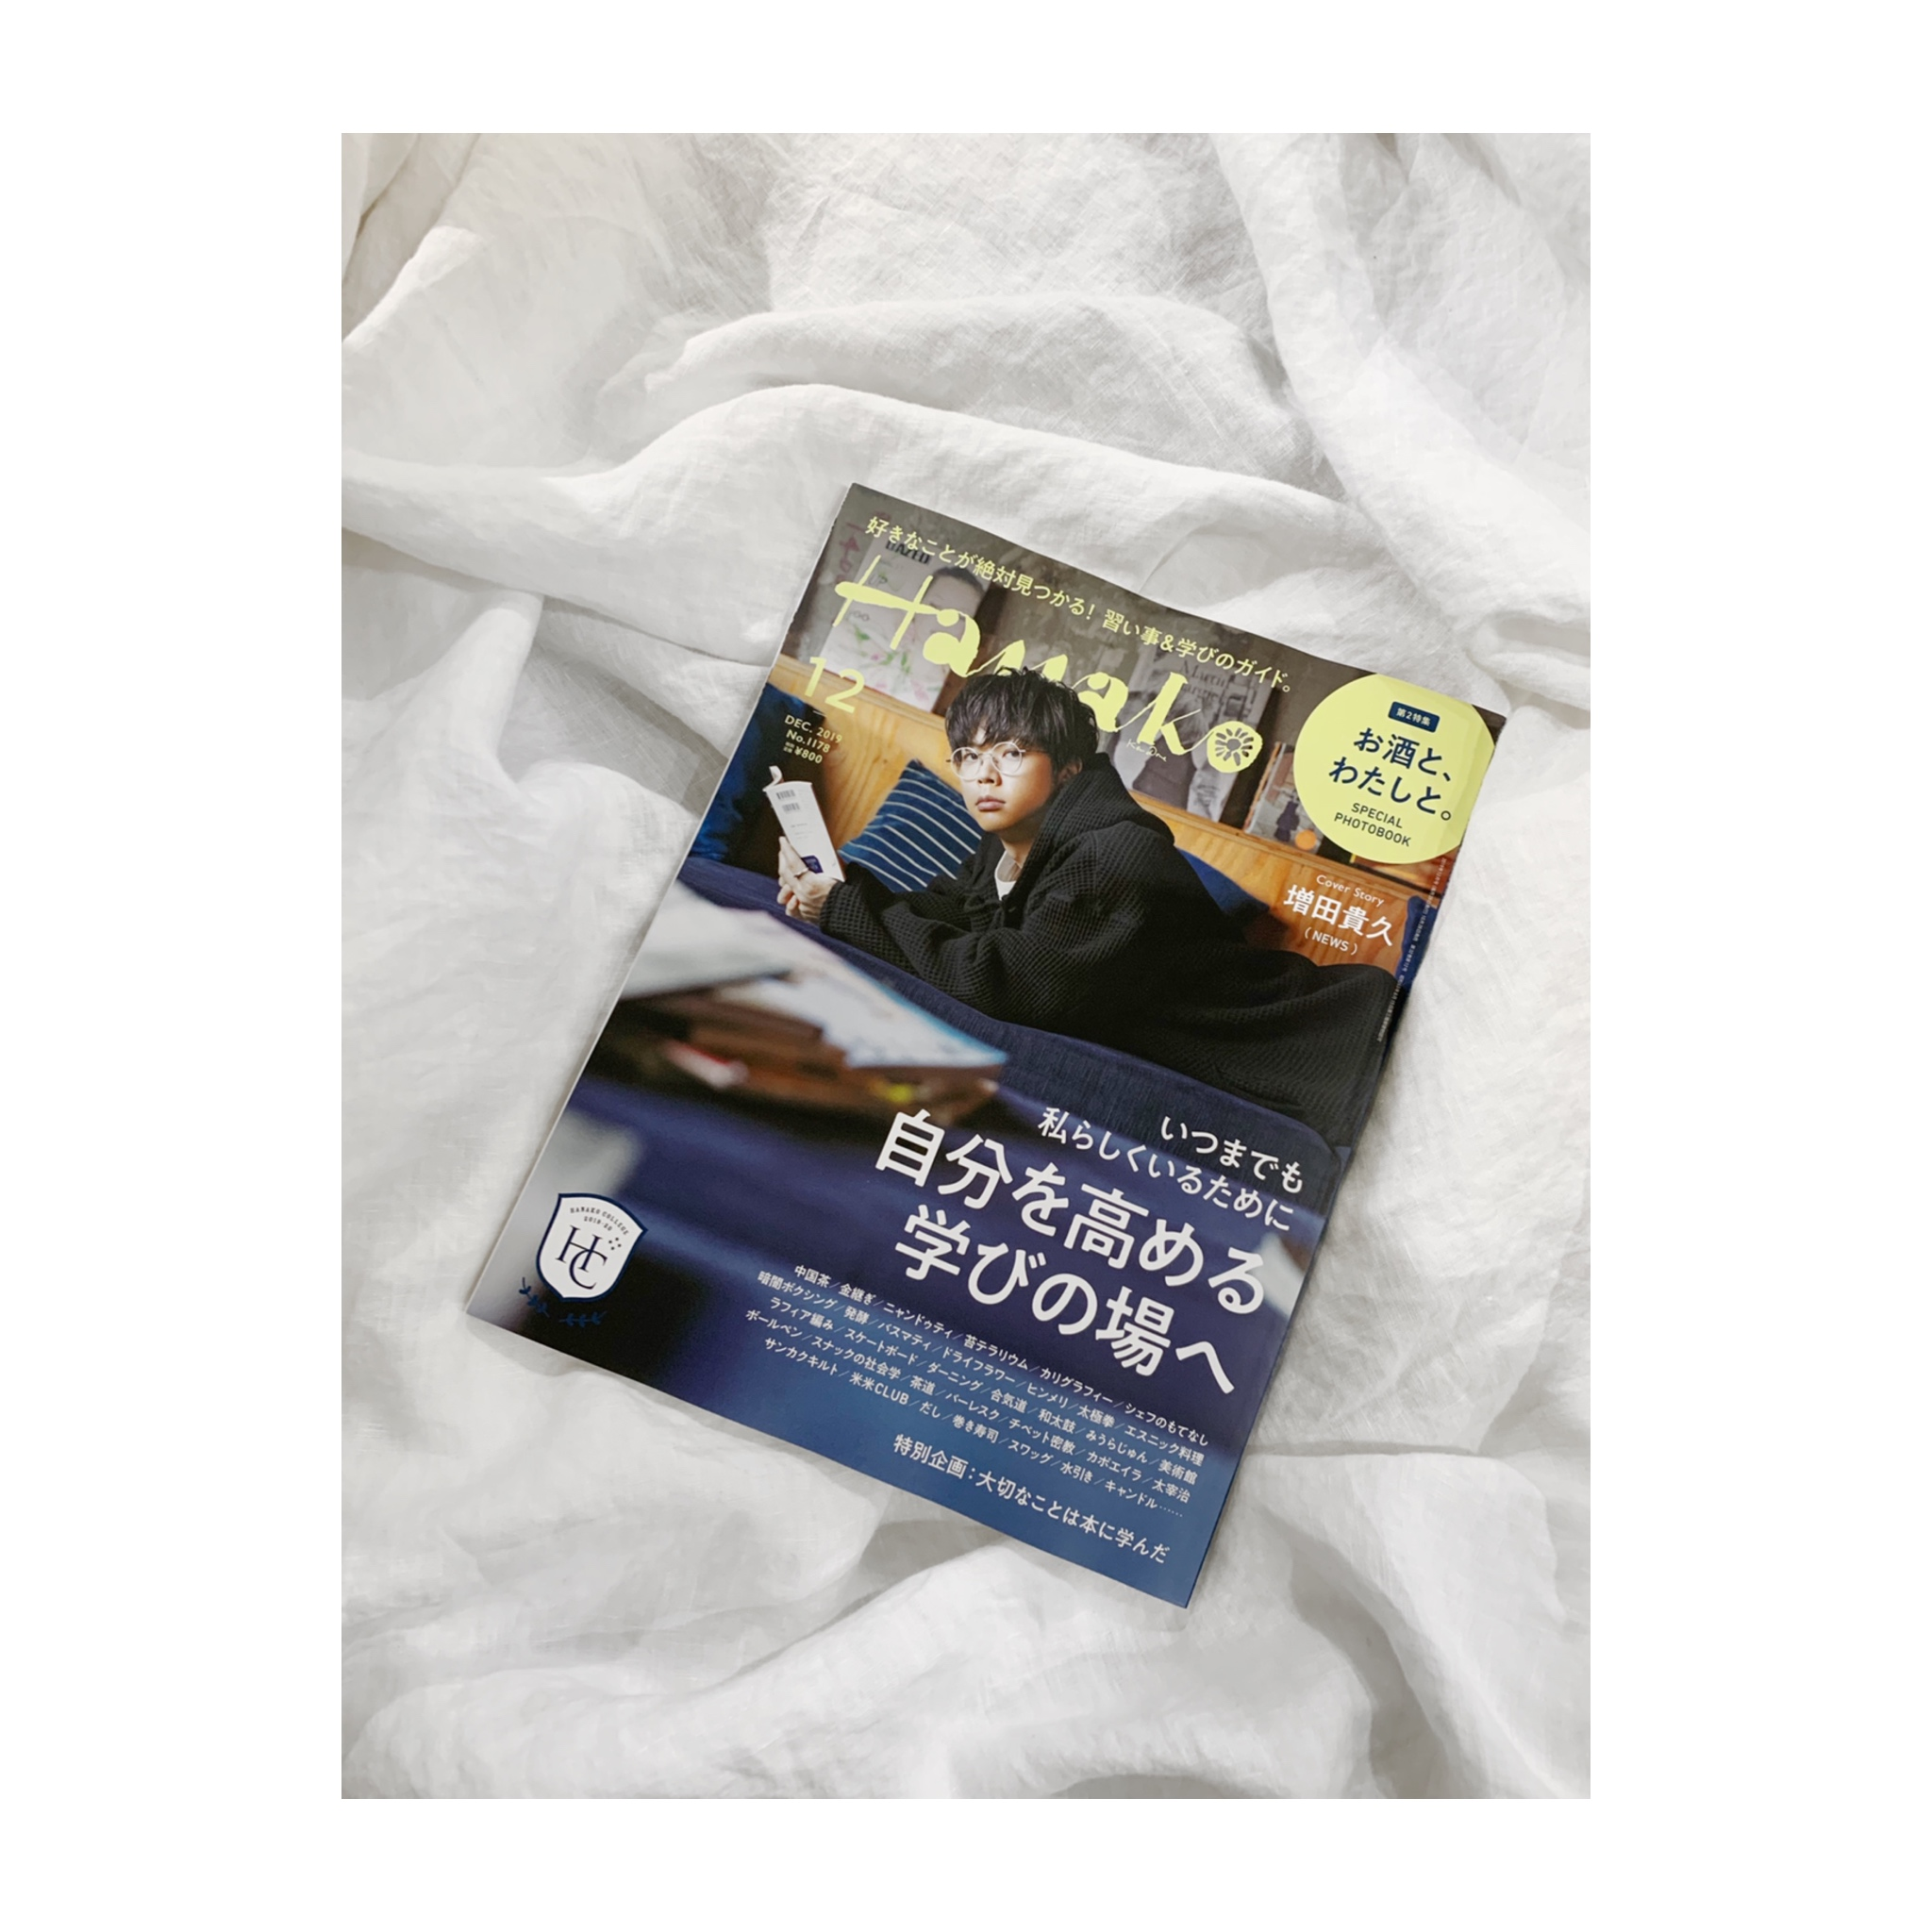 【press release】HANAKO12月号 増田貴久さん着用